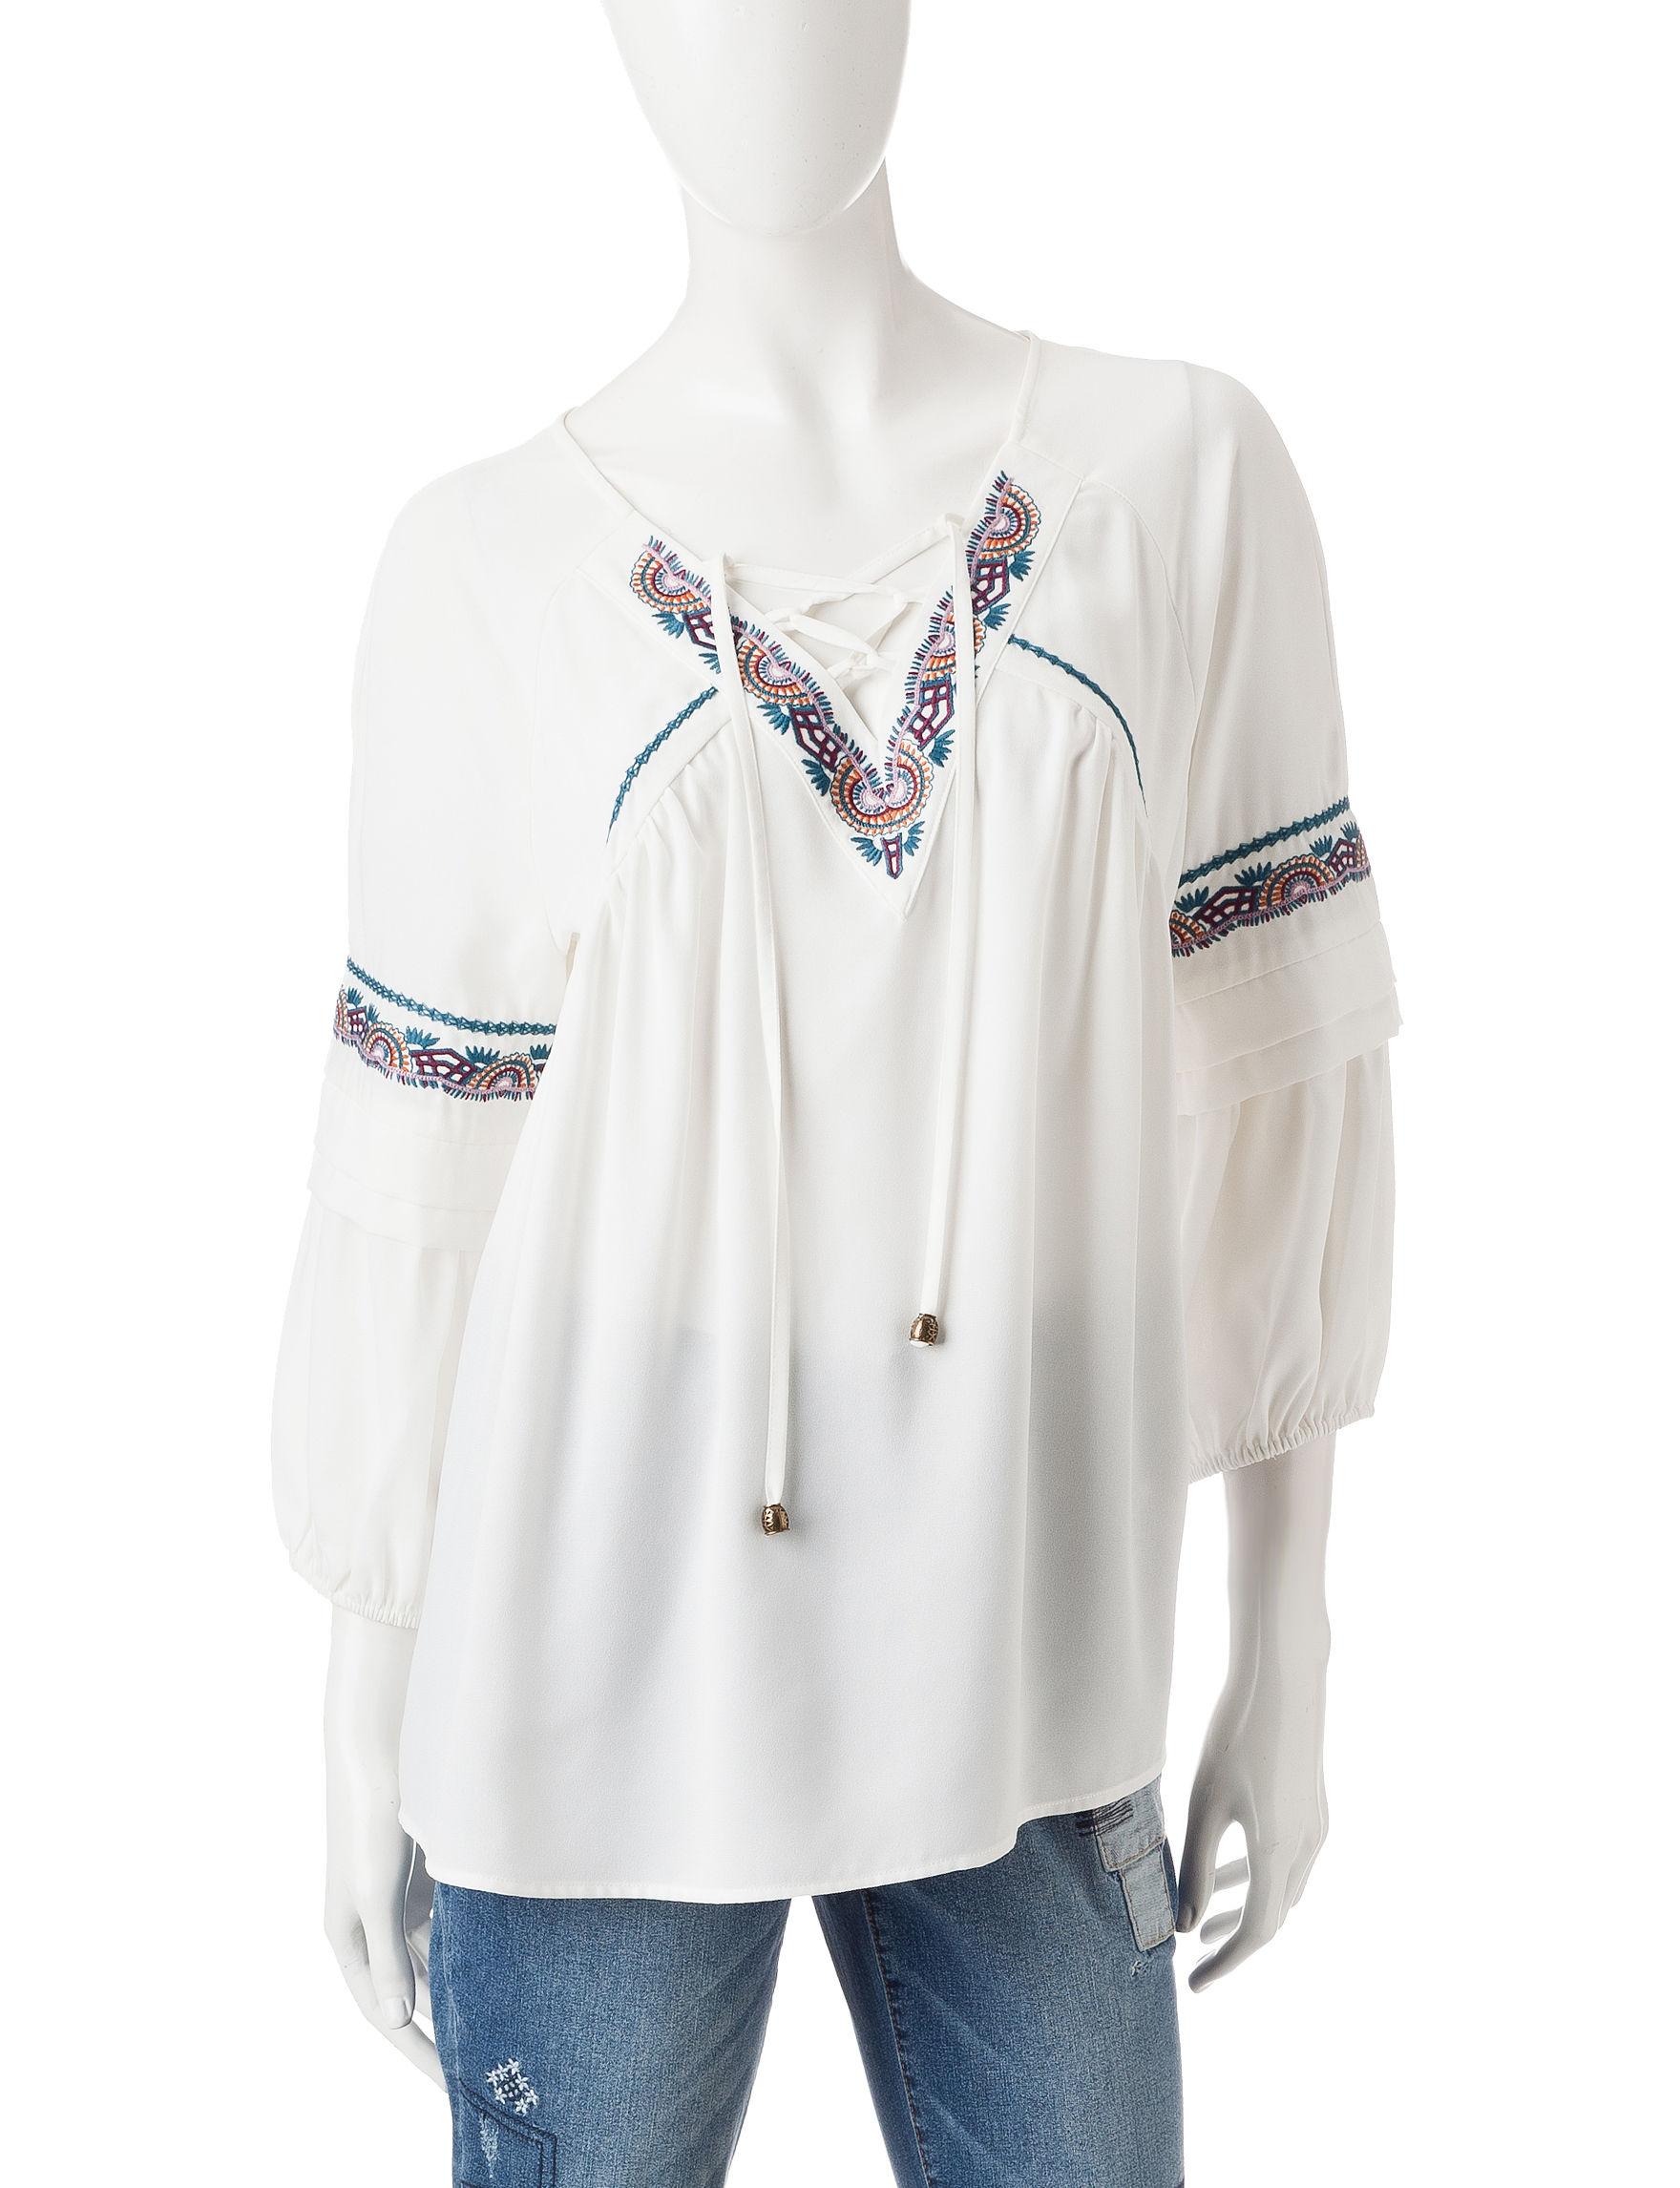 Signature Studio White Shirts & Blouses